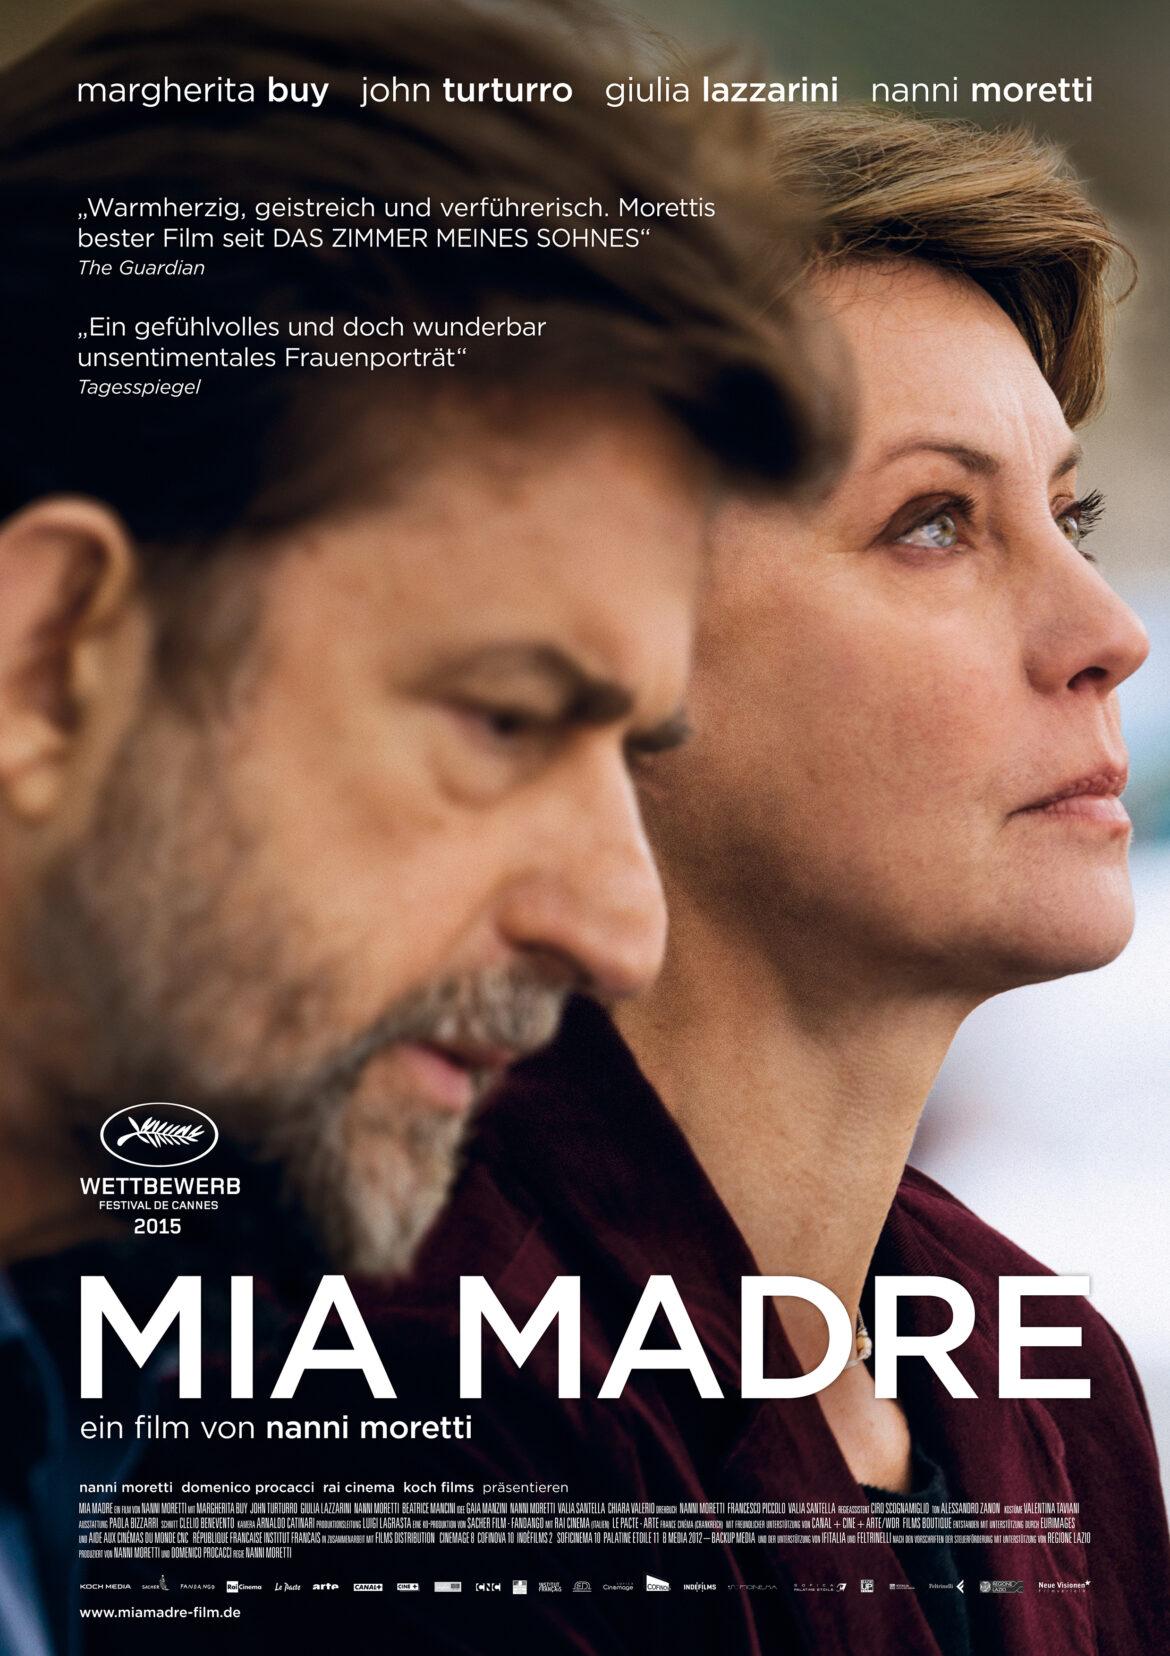 06./ 08./ 09./10. 04.2016 Film: Mia madre